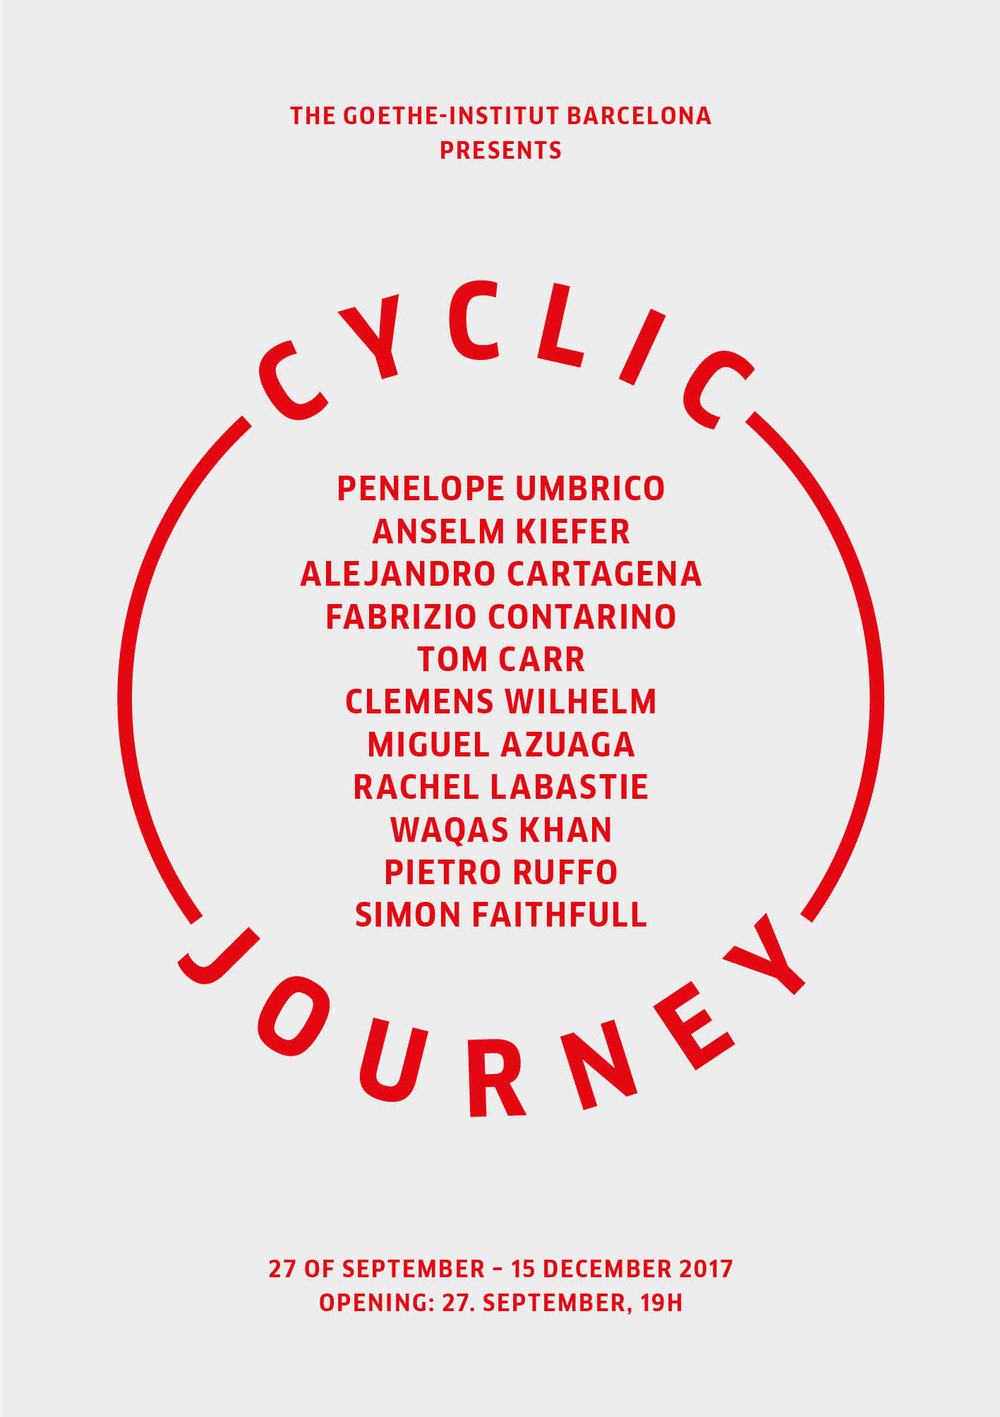 GI-CyclicJourneys-Portada-Finaljpg.jpg